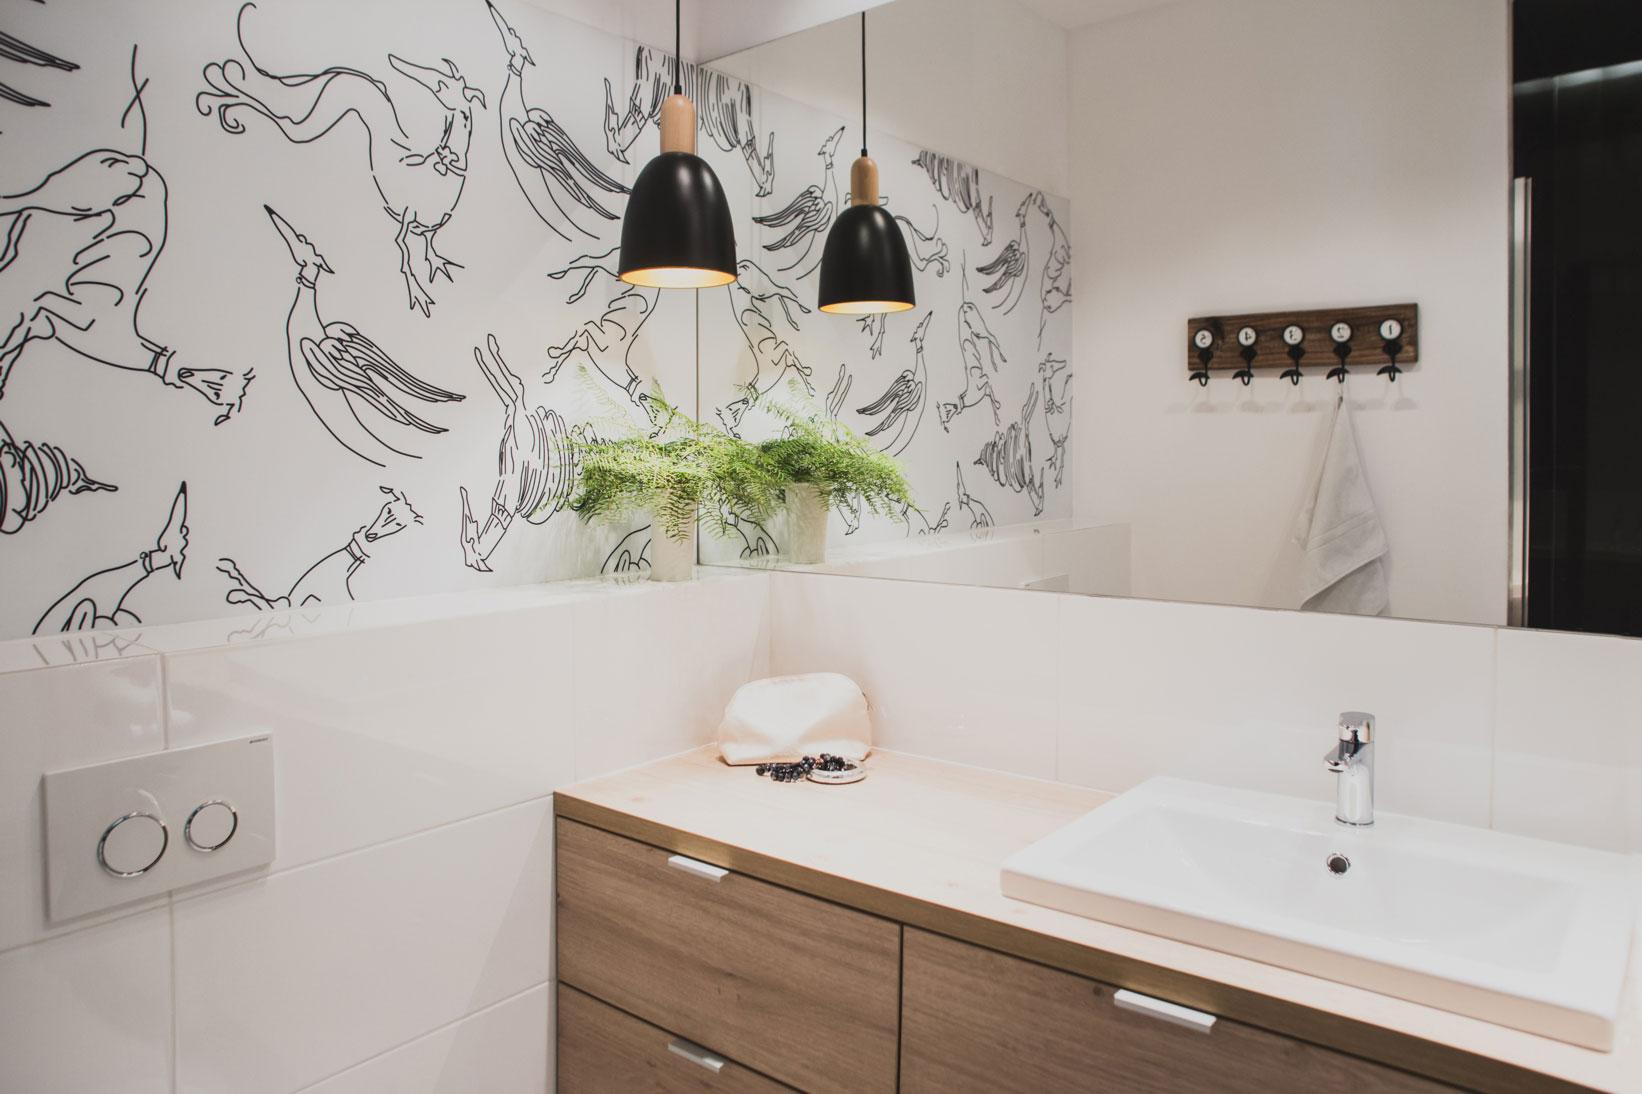 Szafarnia 2 Compact Apartment by Raca Architekci-20